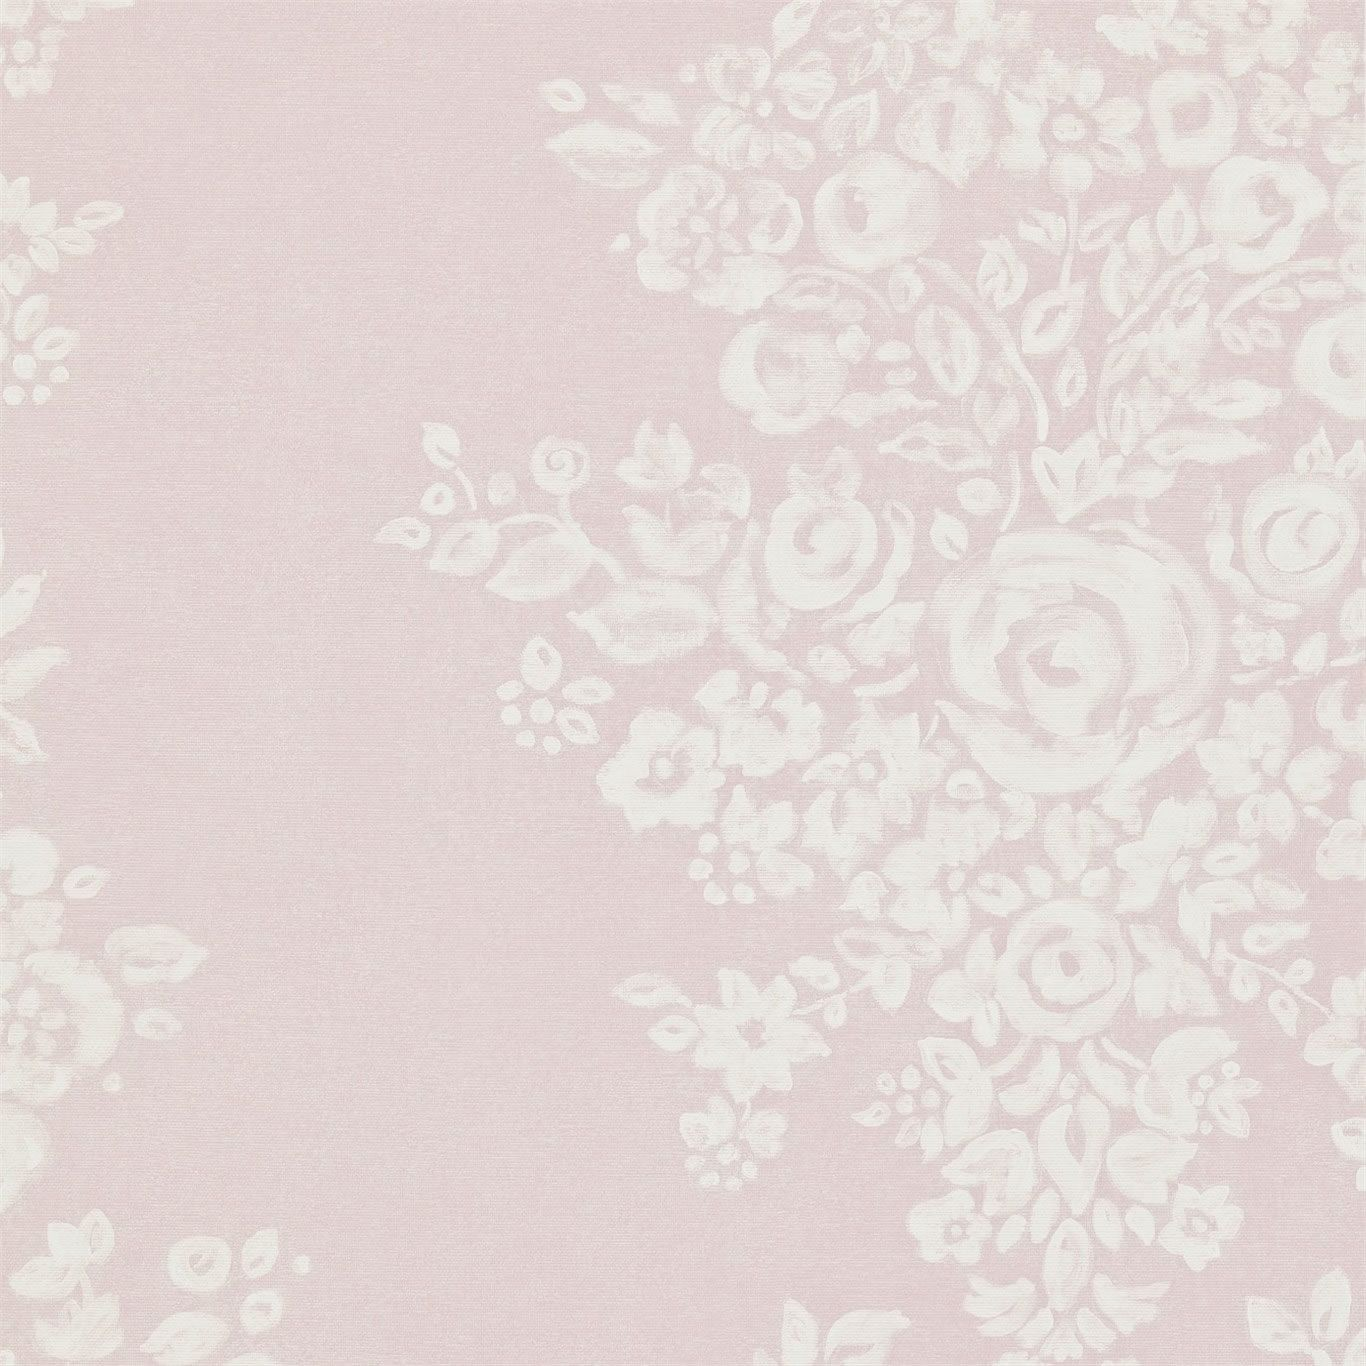 Cream   212856   Freya   Floral Damask   Madison   Sanderson Wallpaper 1366x1366